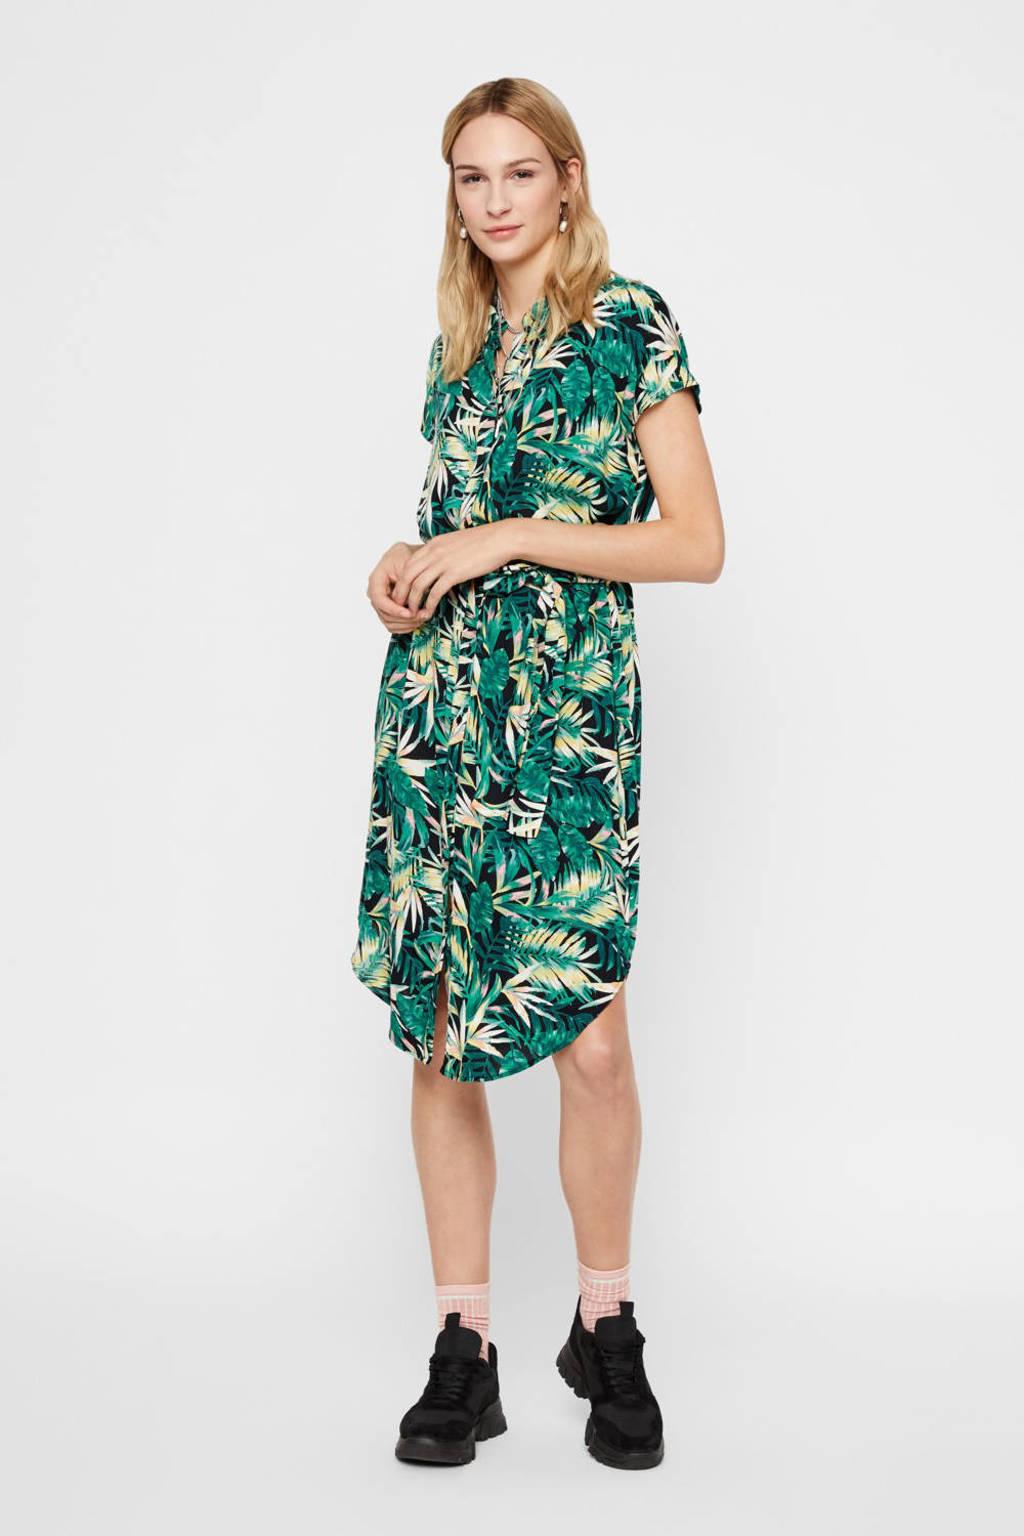 PIECES blousejurk met all over print en ceintuur groen, Groen